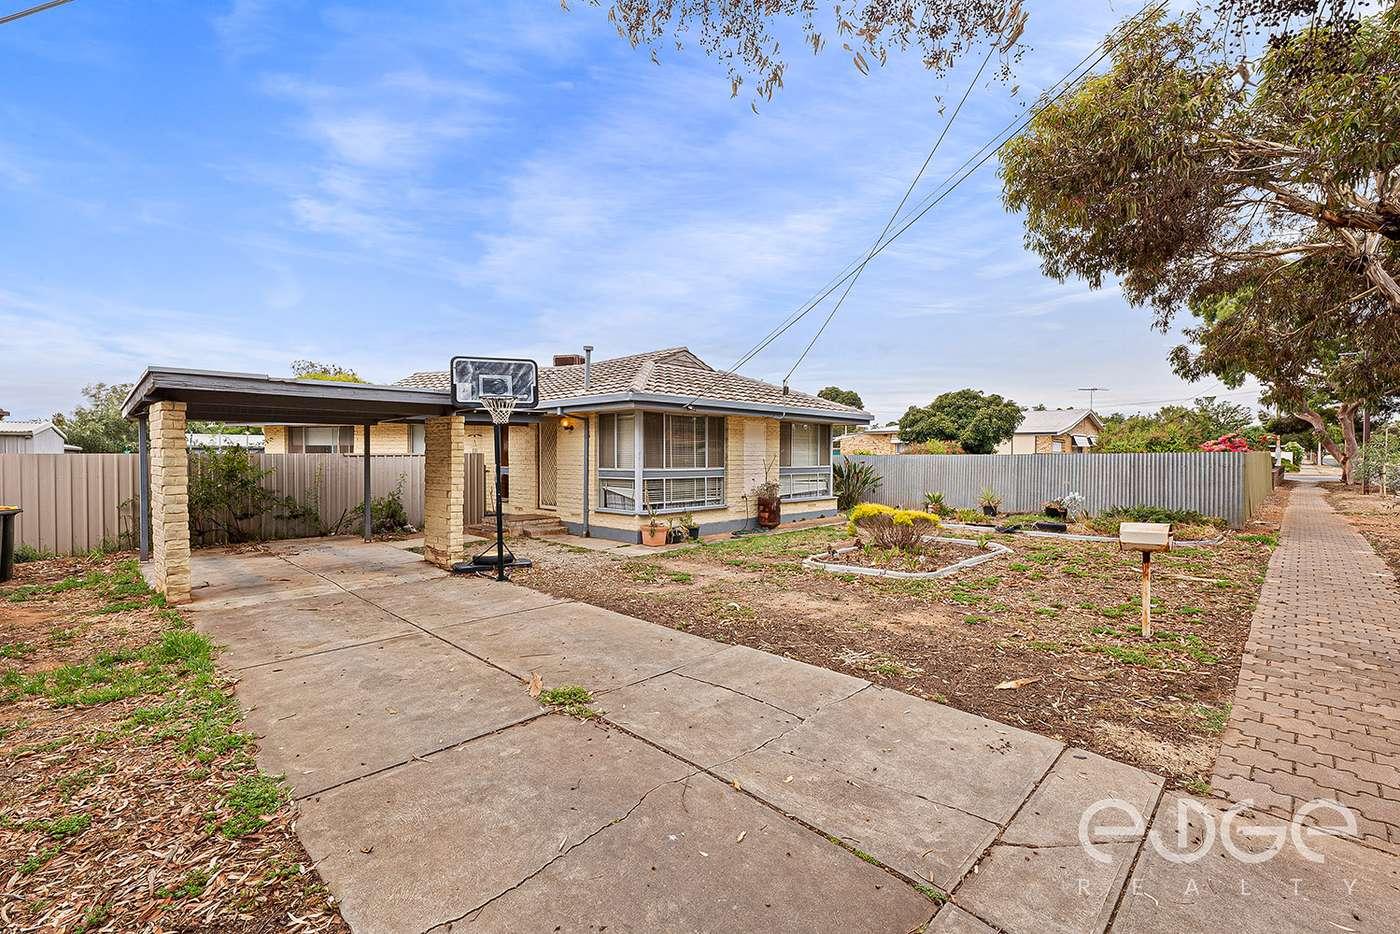 Main view of Homely house listing, 37 Quadrant Avenue, Salisbury North SA 5108